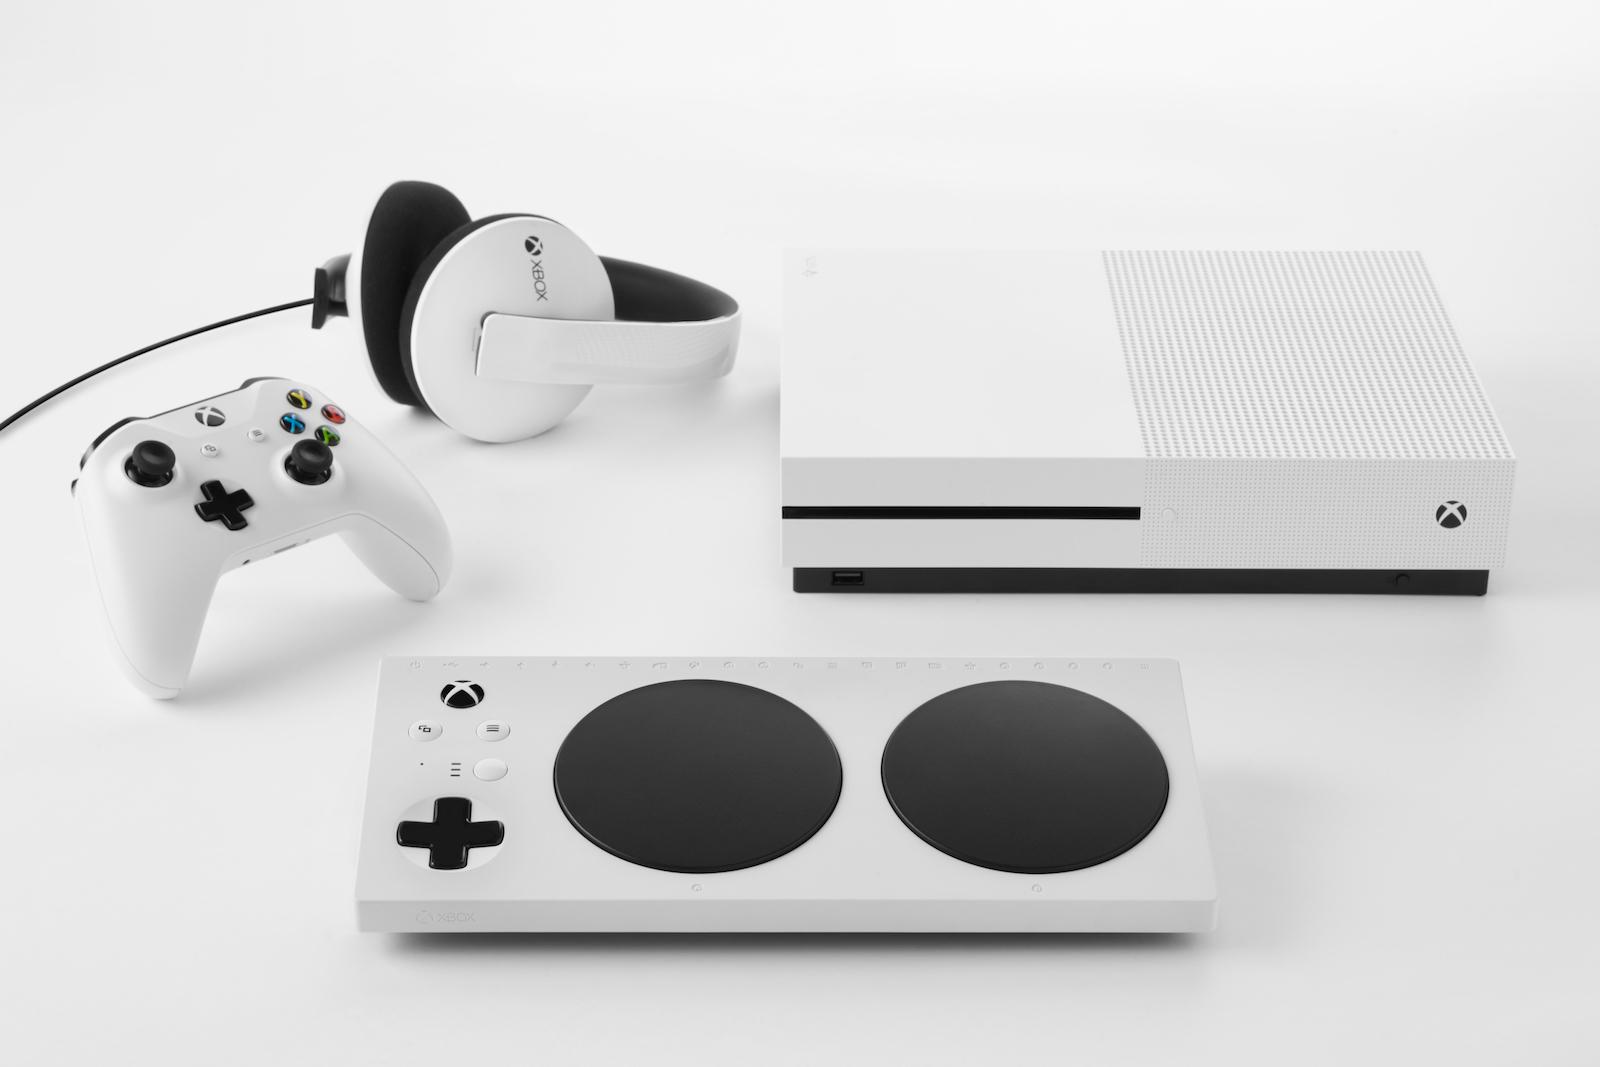 XboxAdaptiveController106.jpg#asset:4525